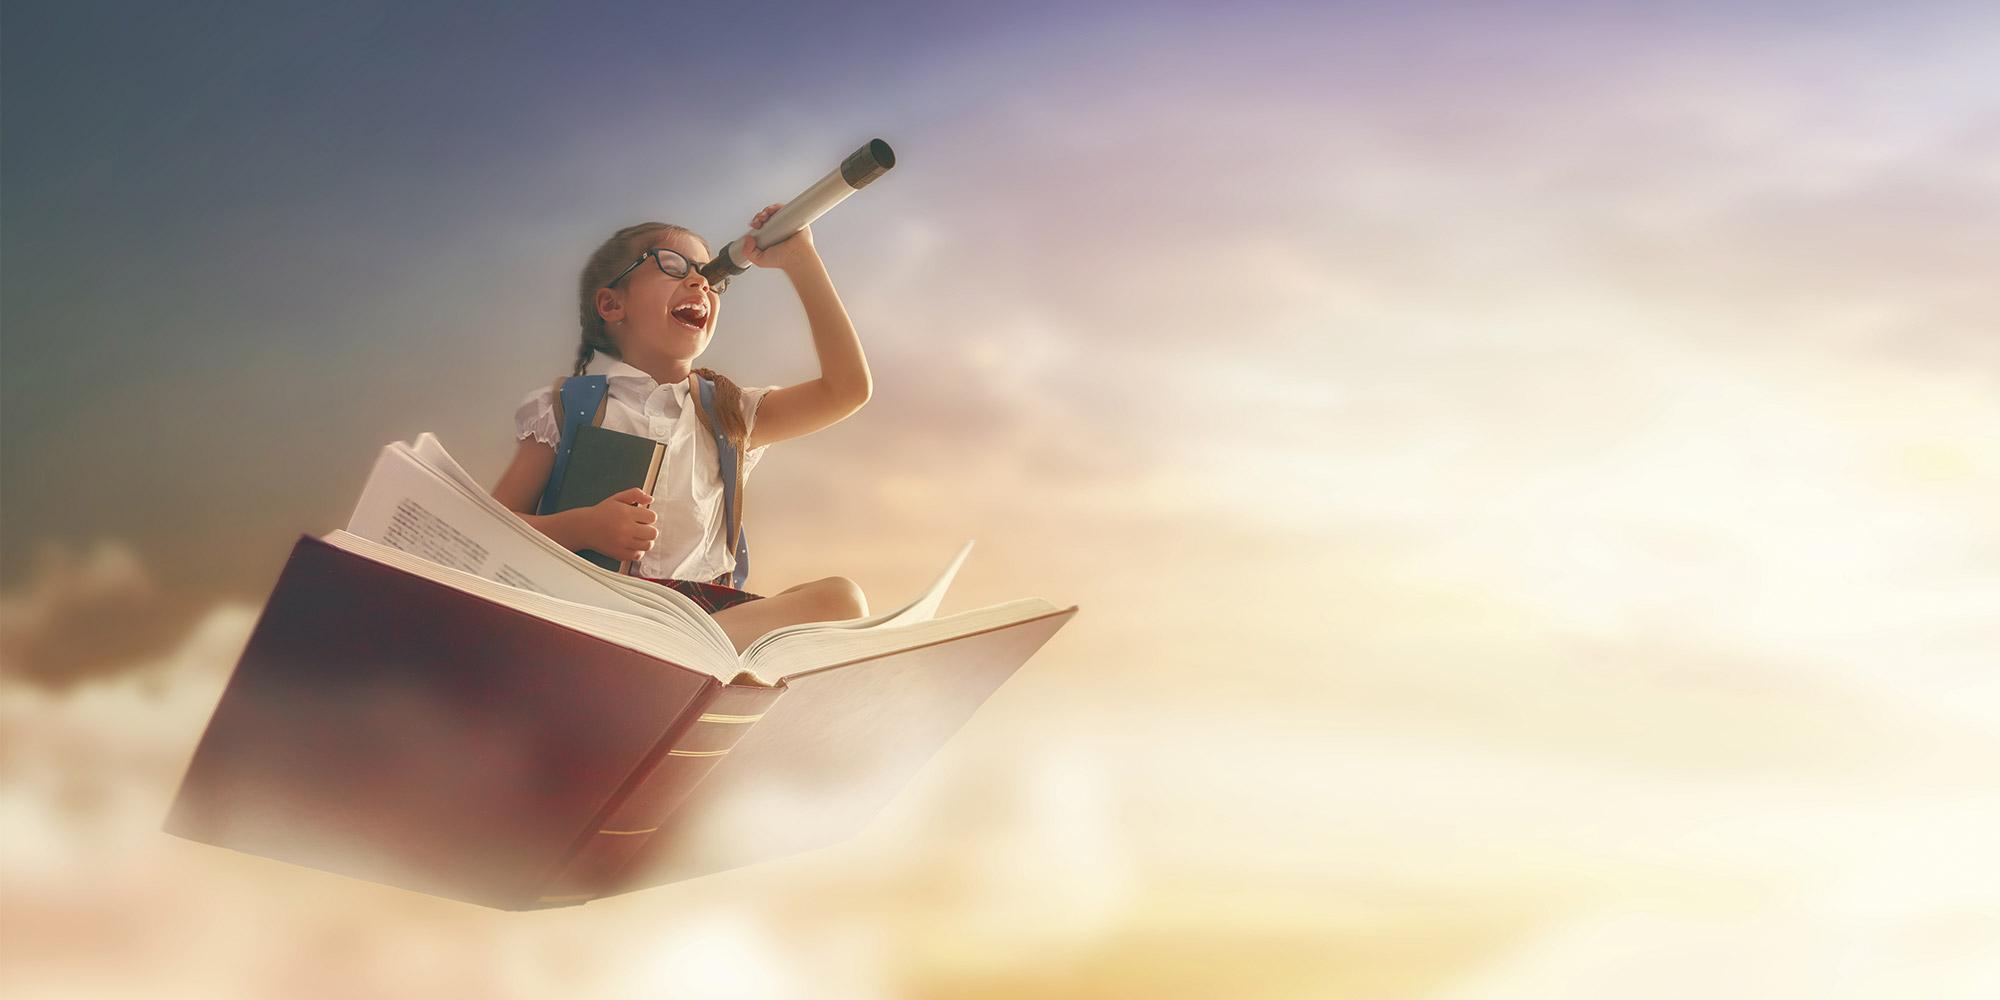 niña volando sobre libro con catalejo